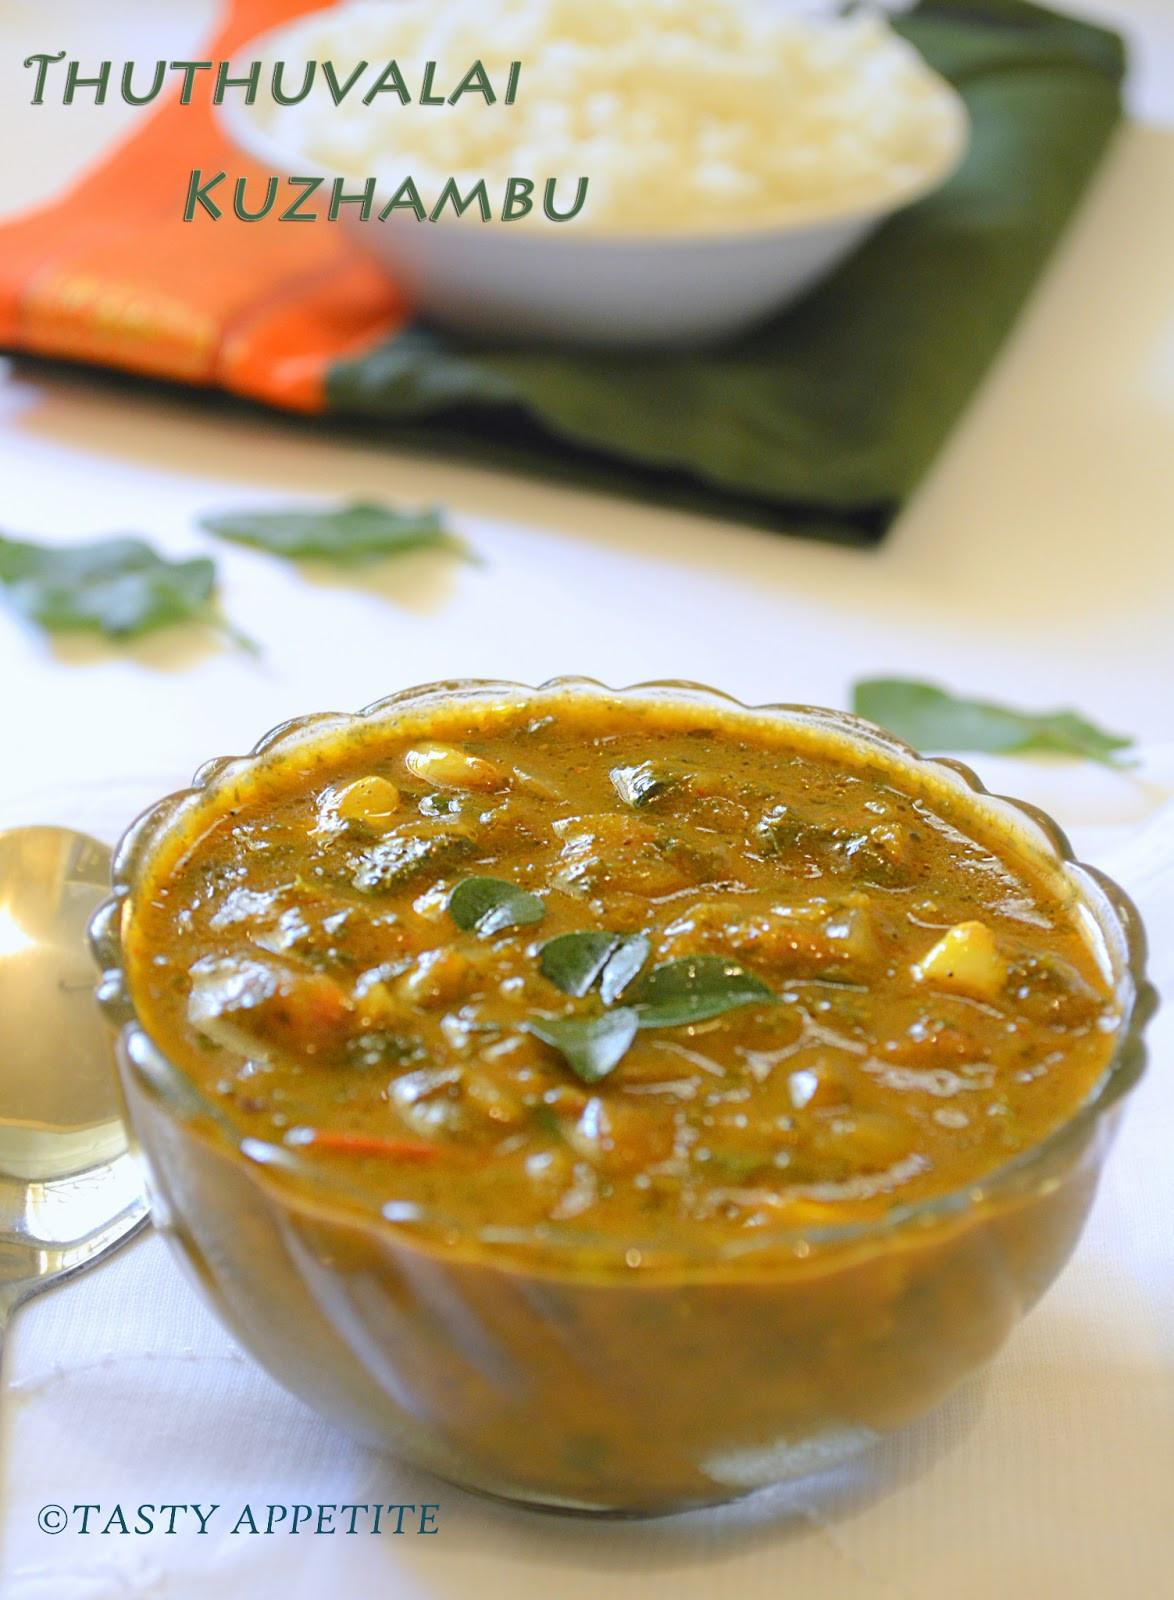 Is Gravy Healthy  How to make Thuthuvalai Kuzhambu Spinach Gravy Healthy